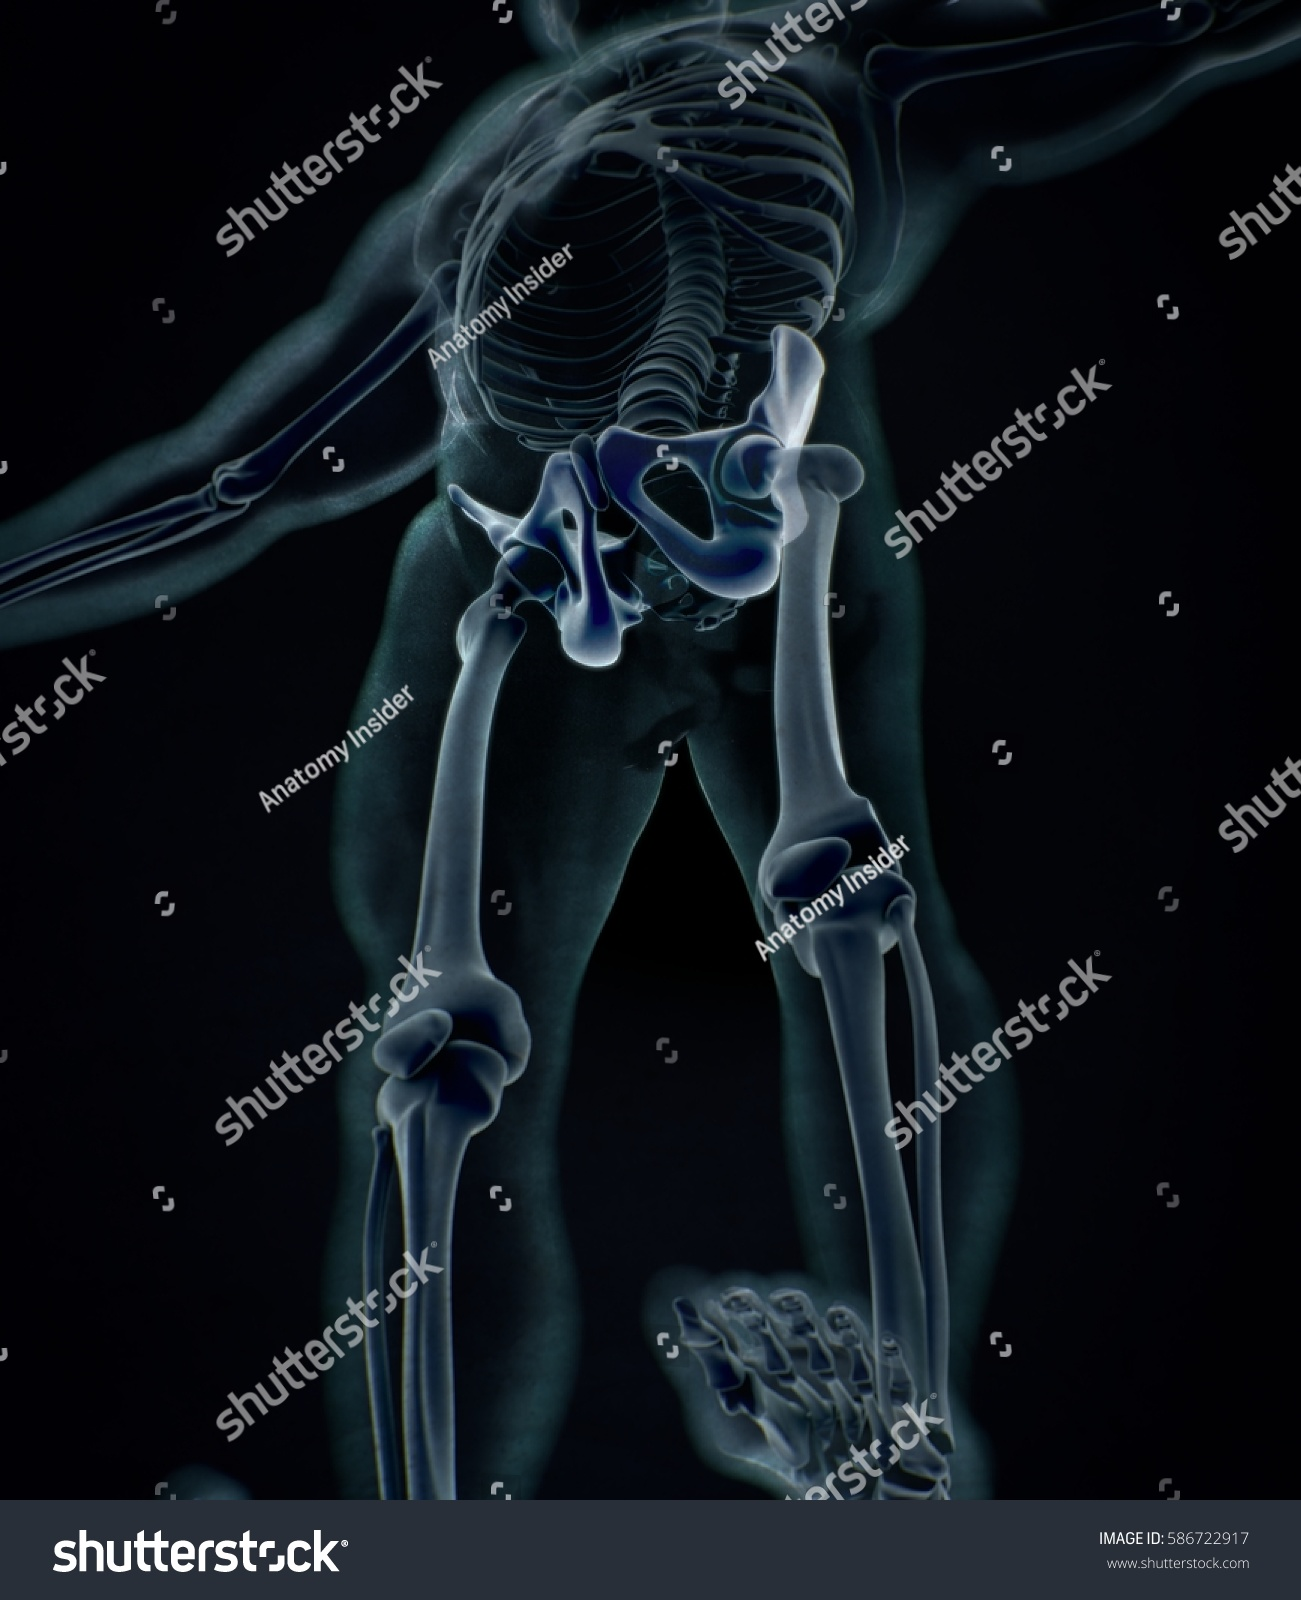 Ilium bone, hip bone or pelvis. Human anatomy, bone skeletal ...